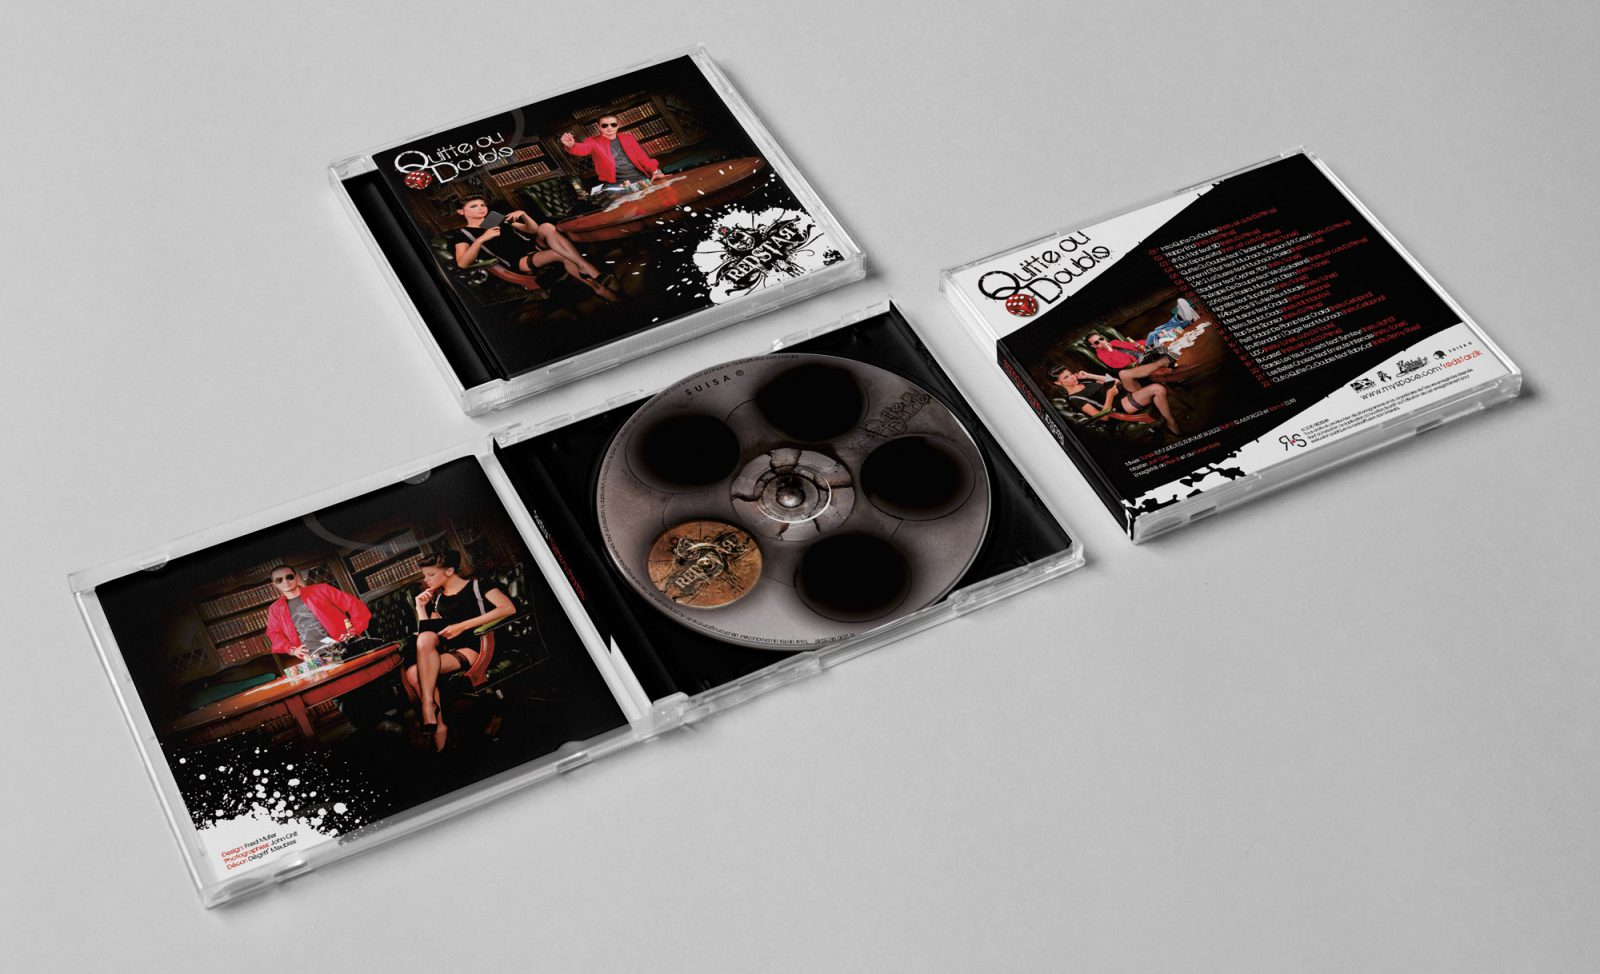 redstar-hip-hop-versoix-pochette-cd-album-quitteoudouble-fredmuller-graphiste-independant-freelance-print-webdesign-suisse-geneve-lausanne-1